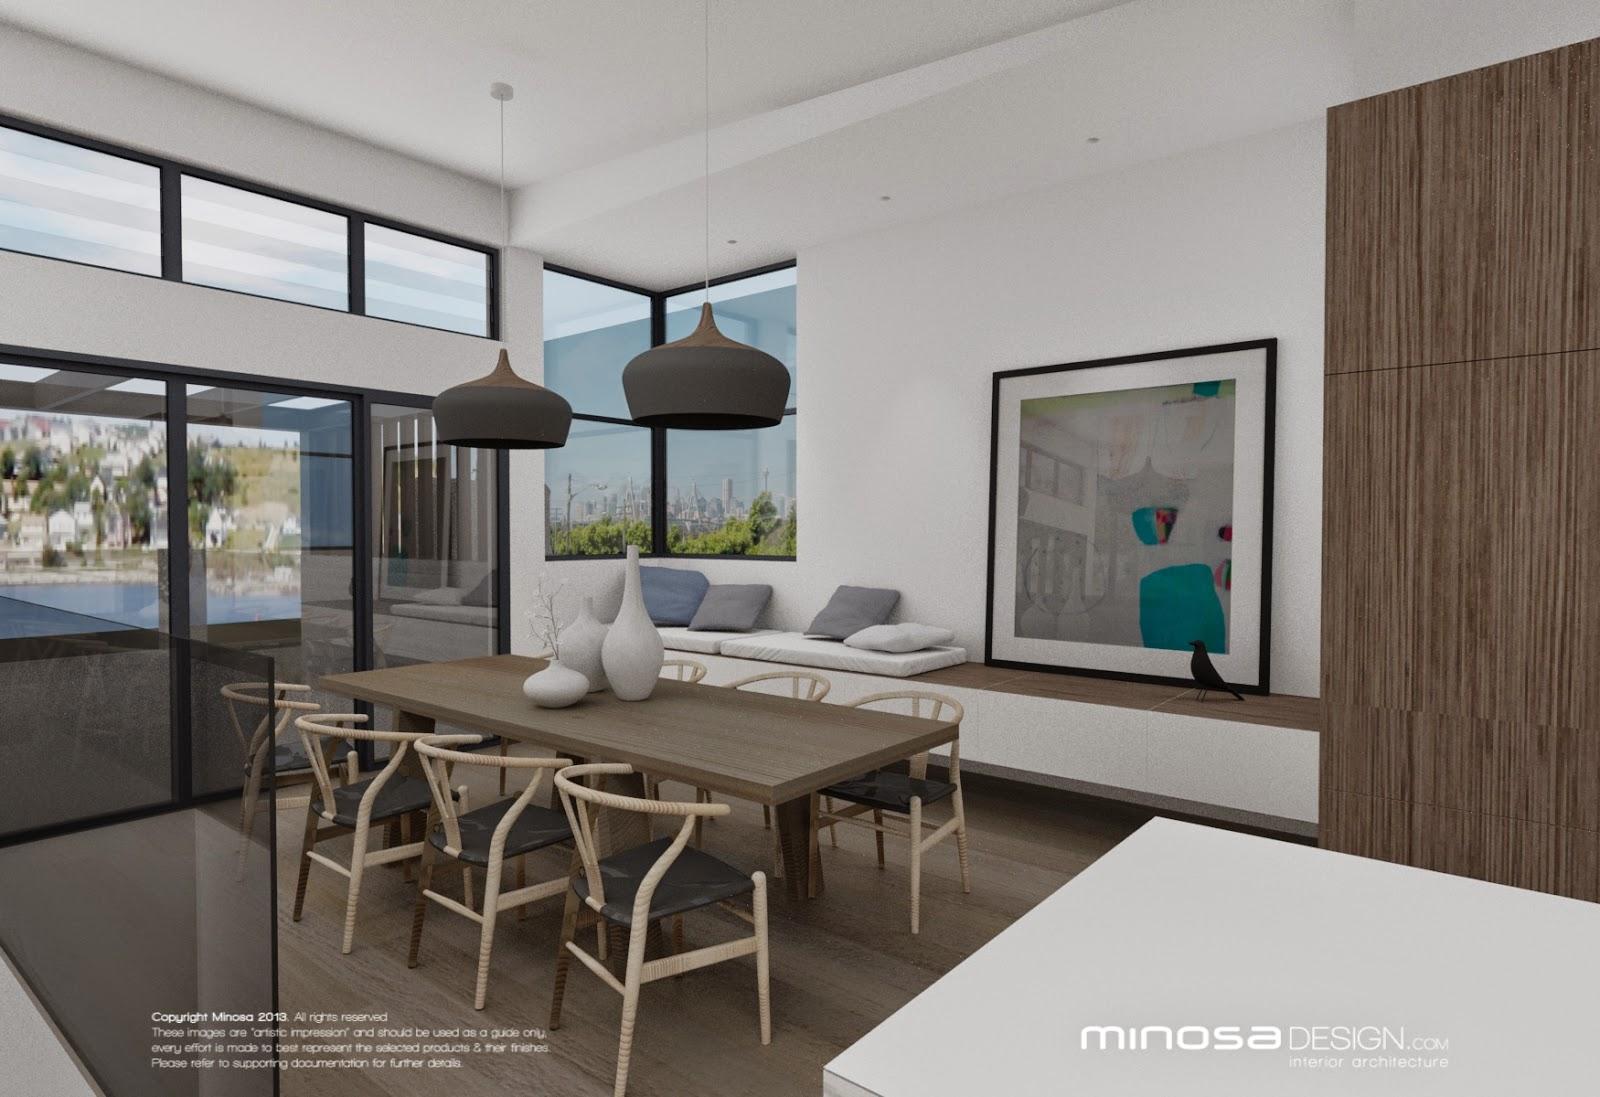 Minosa Kitchen Living Dinning Room Modern Interior Design Help Sydney  All Glass Wood Gloor Marble Inner West Design 023